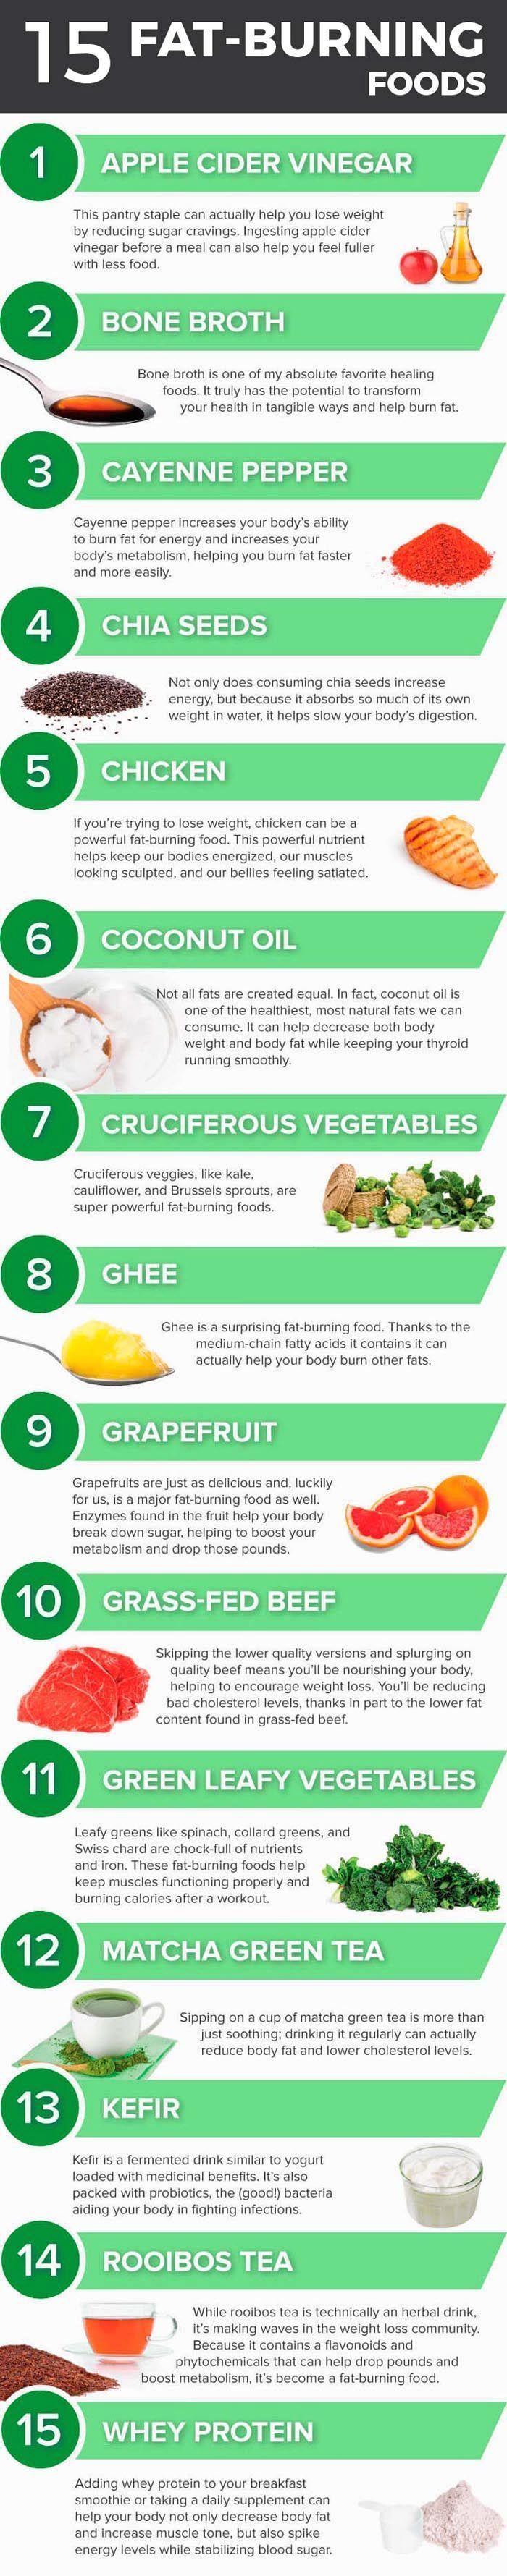 40 Best-Ever Fat-Burning Foods